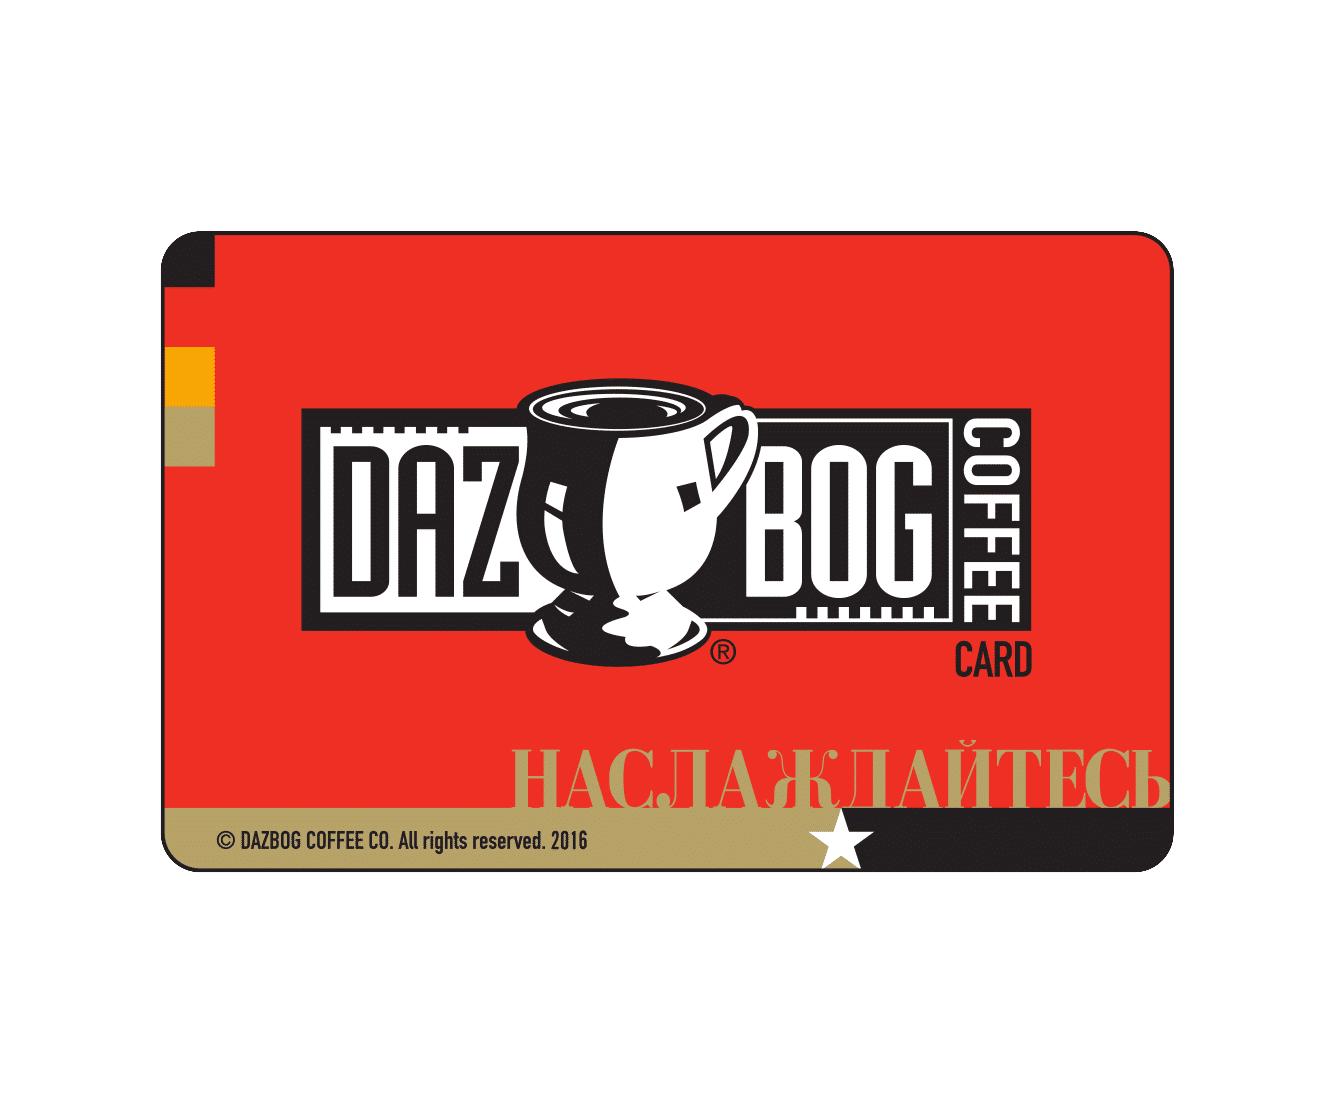 Gift card dazbog coffee dazbog giftcard negle Images